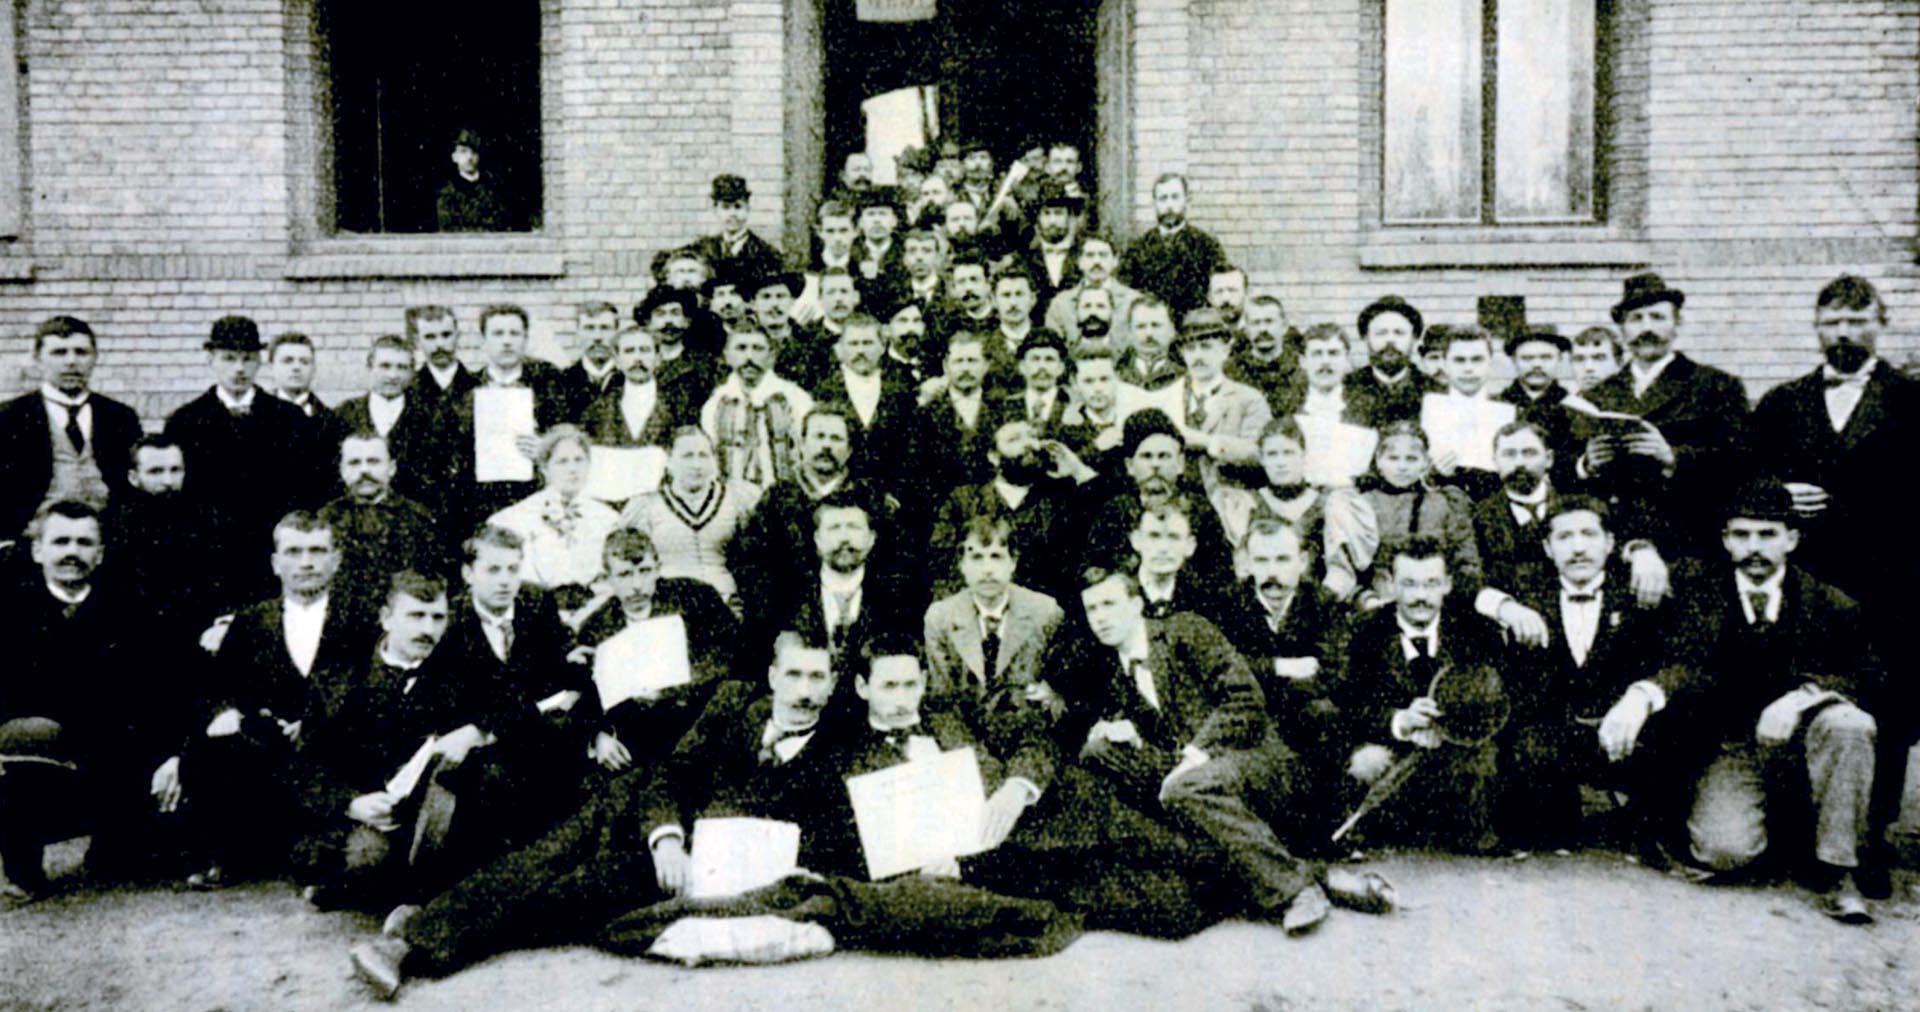 PRVA SOCIJALDEMOKRATSKA STRANKA OSNOVANA JE U ZAGREBU 1894. GODINE POD NAZIVOM SOCIJALDEMOKRATSKA STRANKA HRVATSKE I SLAVONIJE (SDSHS) | Foto: IZLOŽBA '120 GODINA HRVATSKE SOCIJALDEMOKRACIJE'